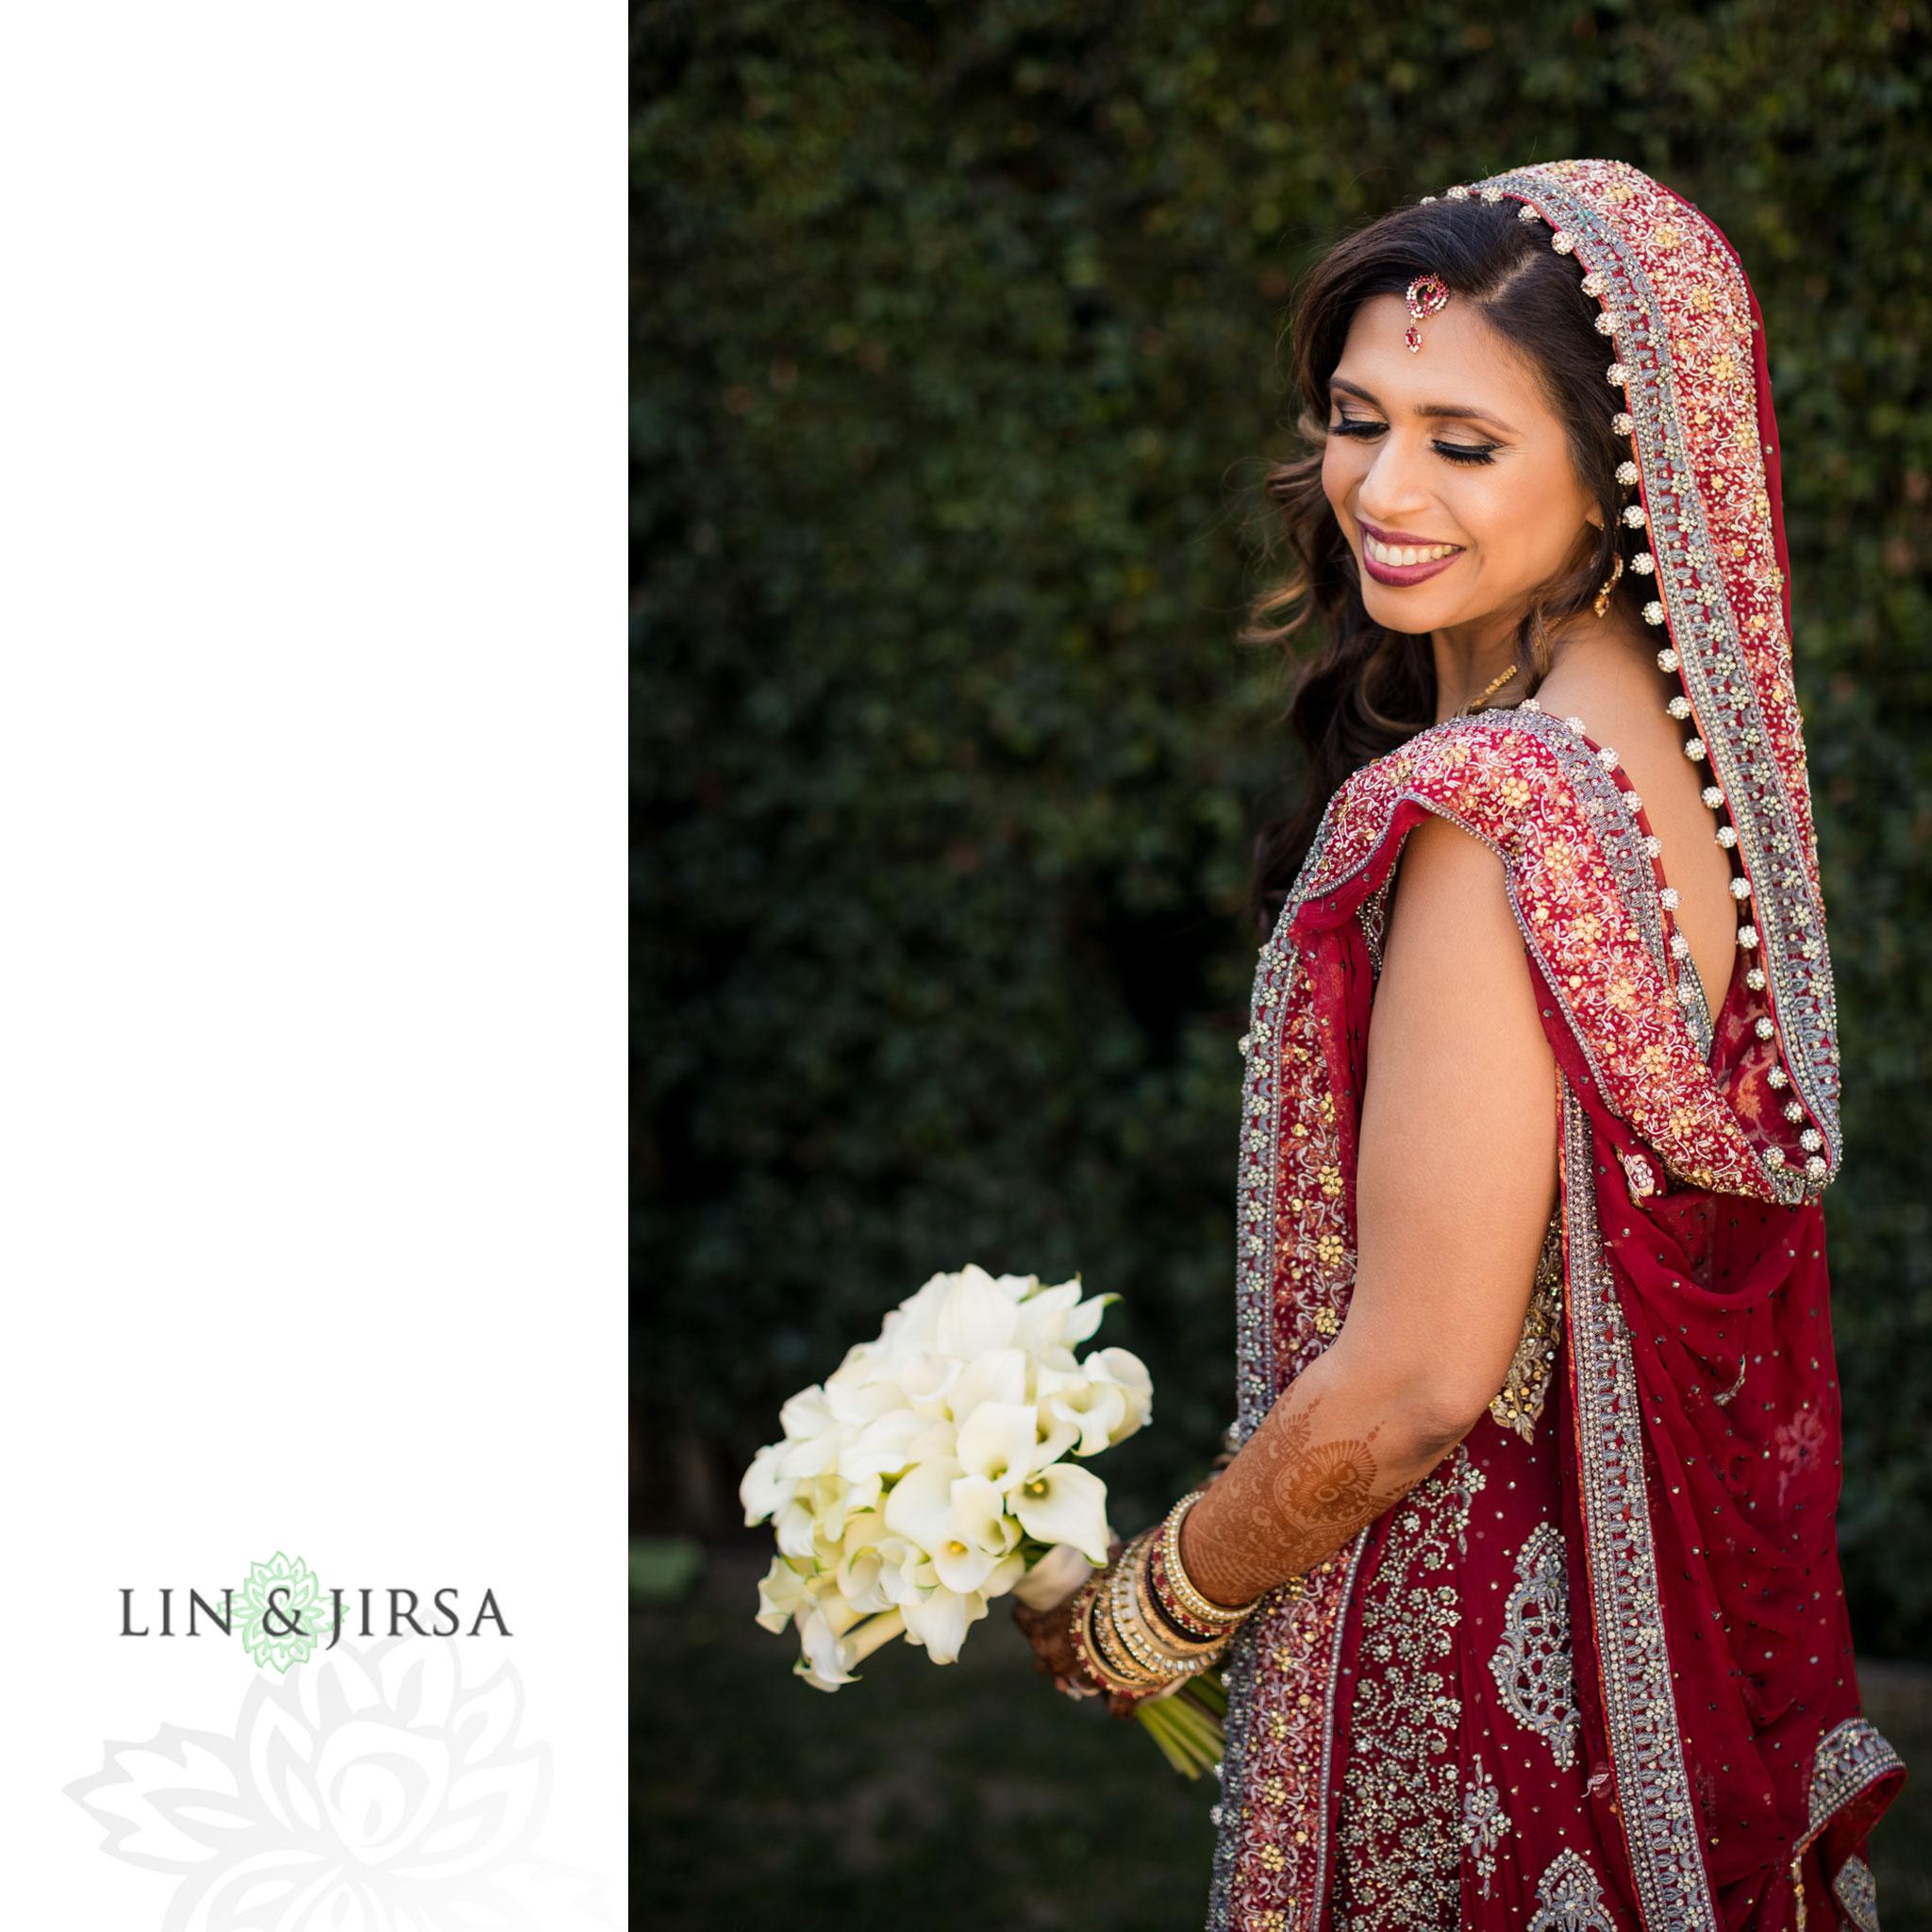 05 altadena town country club pakistani bride wedding photography